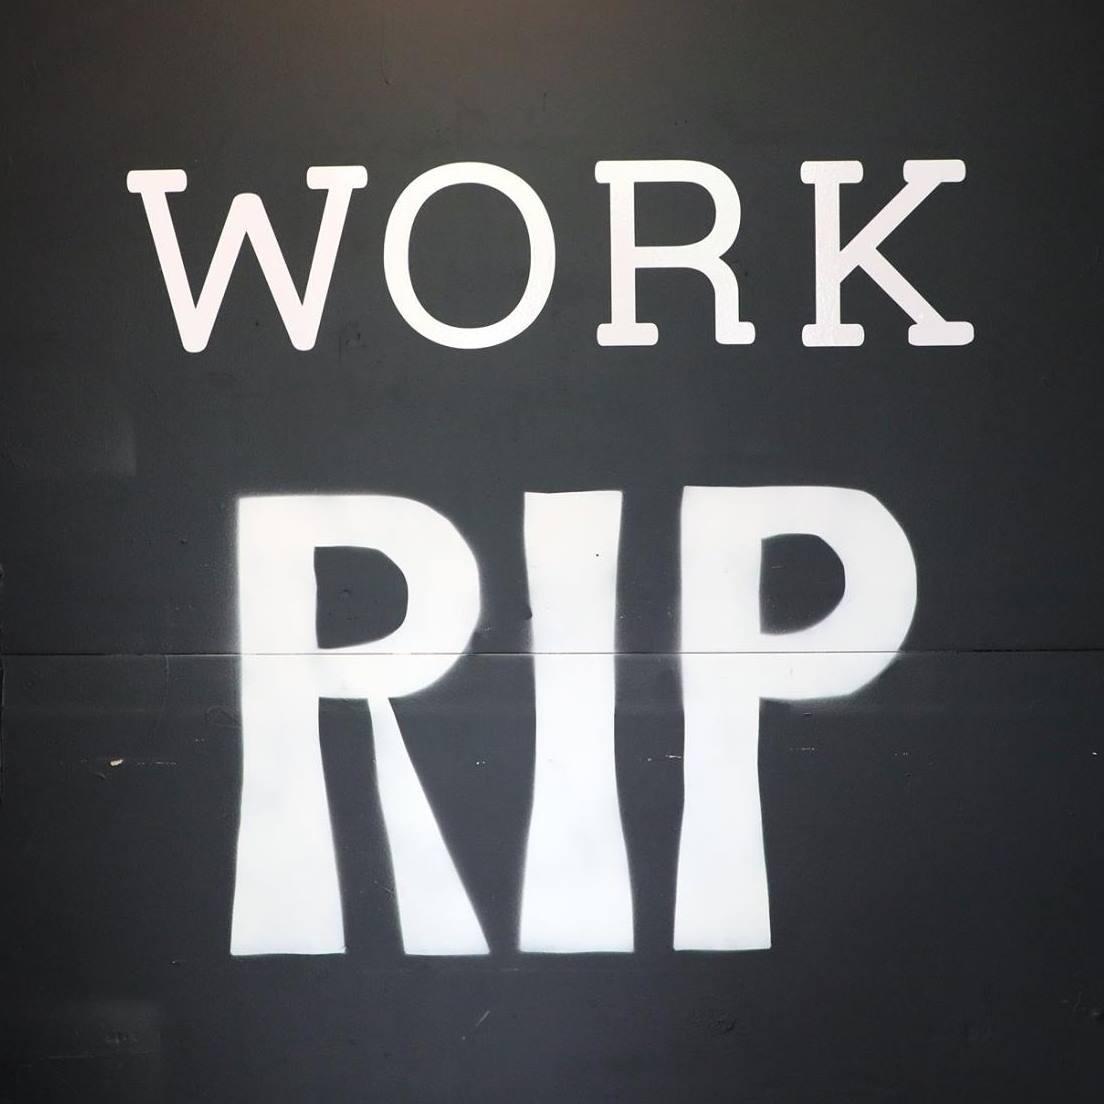 WORK RIP 2018